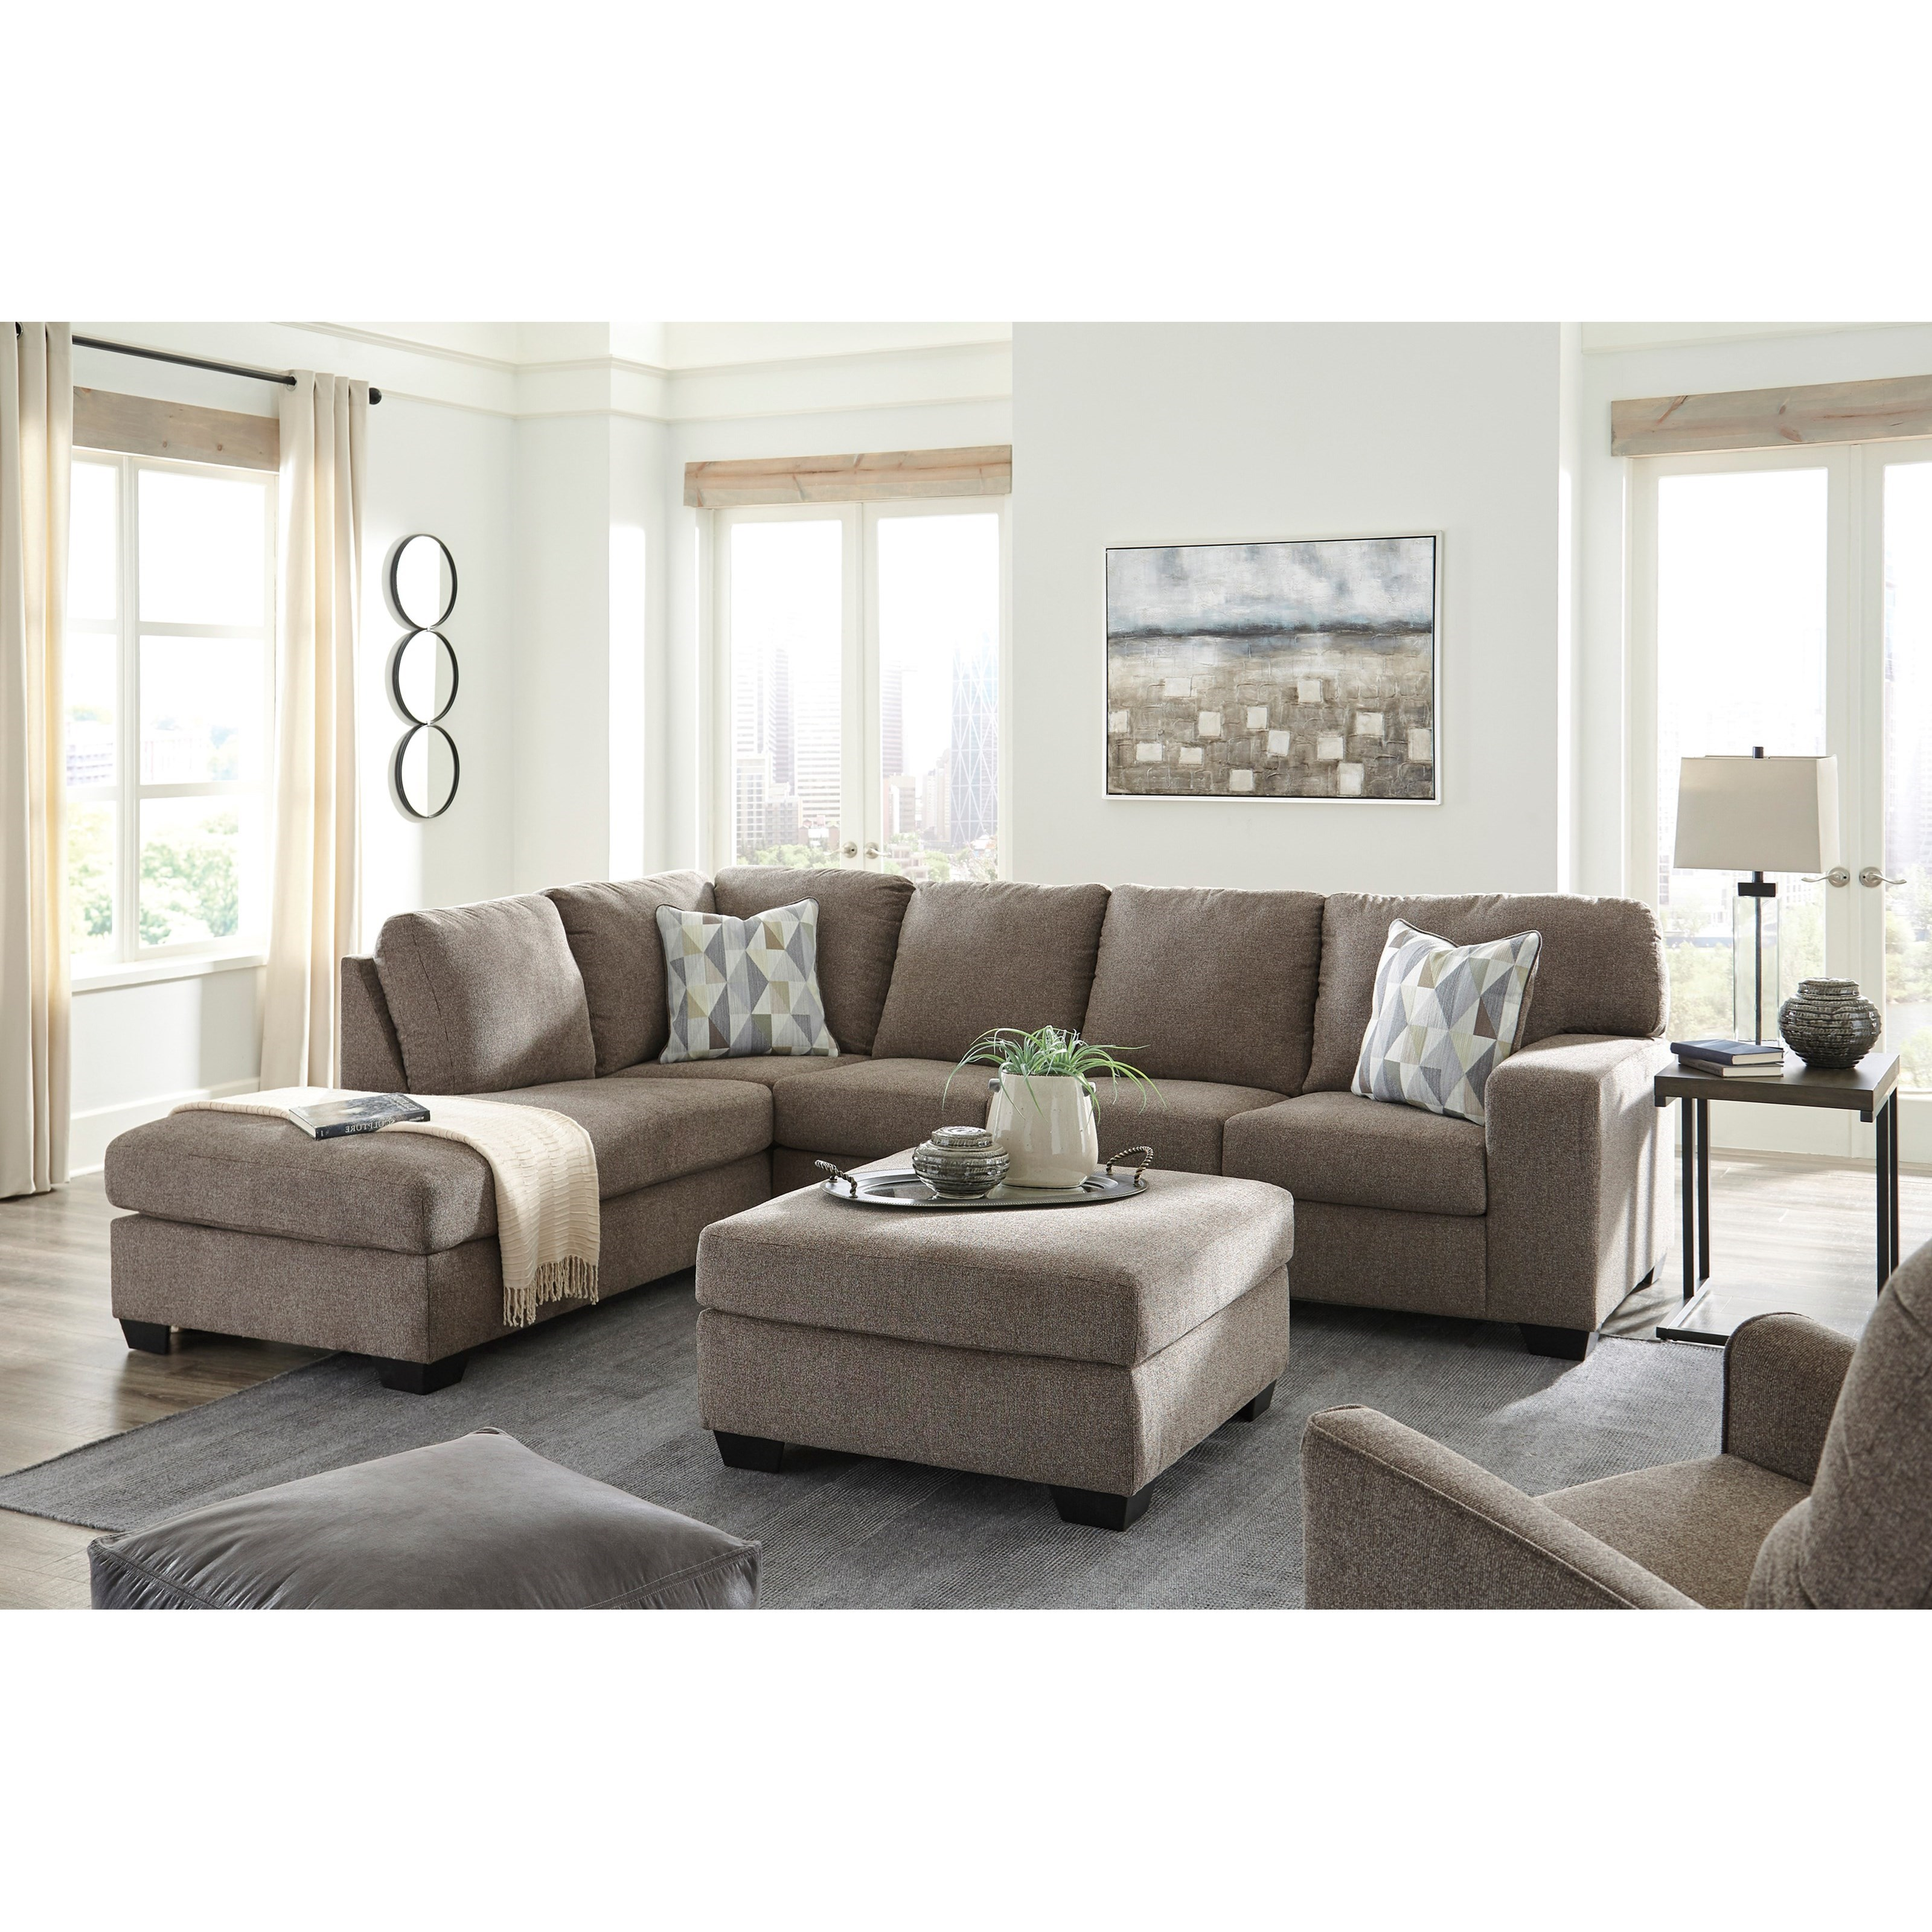 Dalhart Living Room Group by Benchcraft at Walker's Furniture